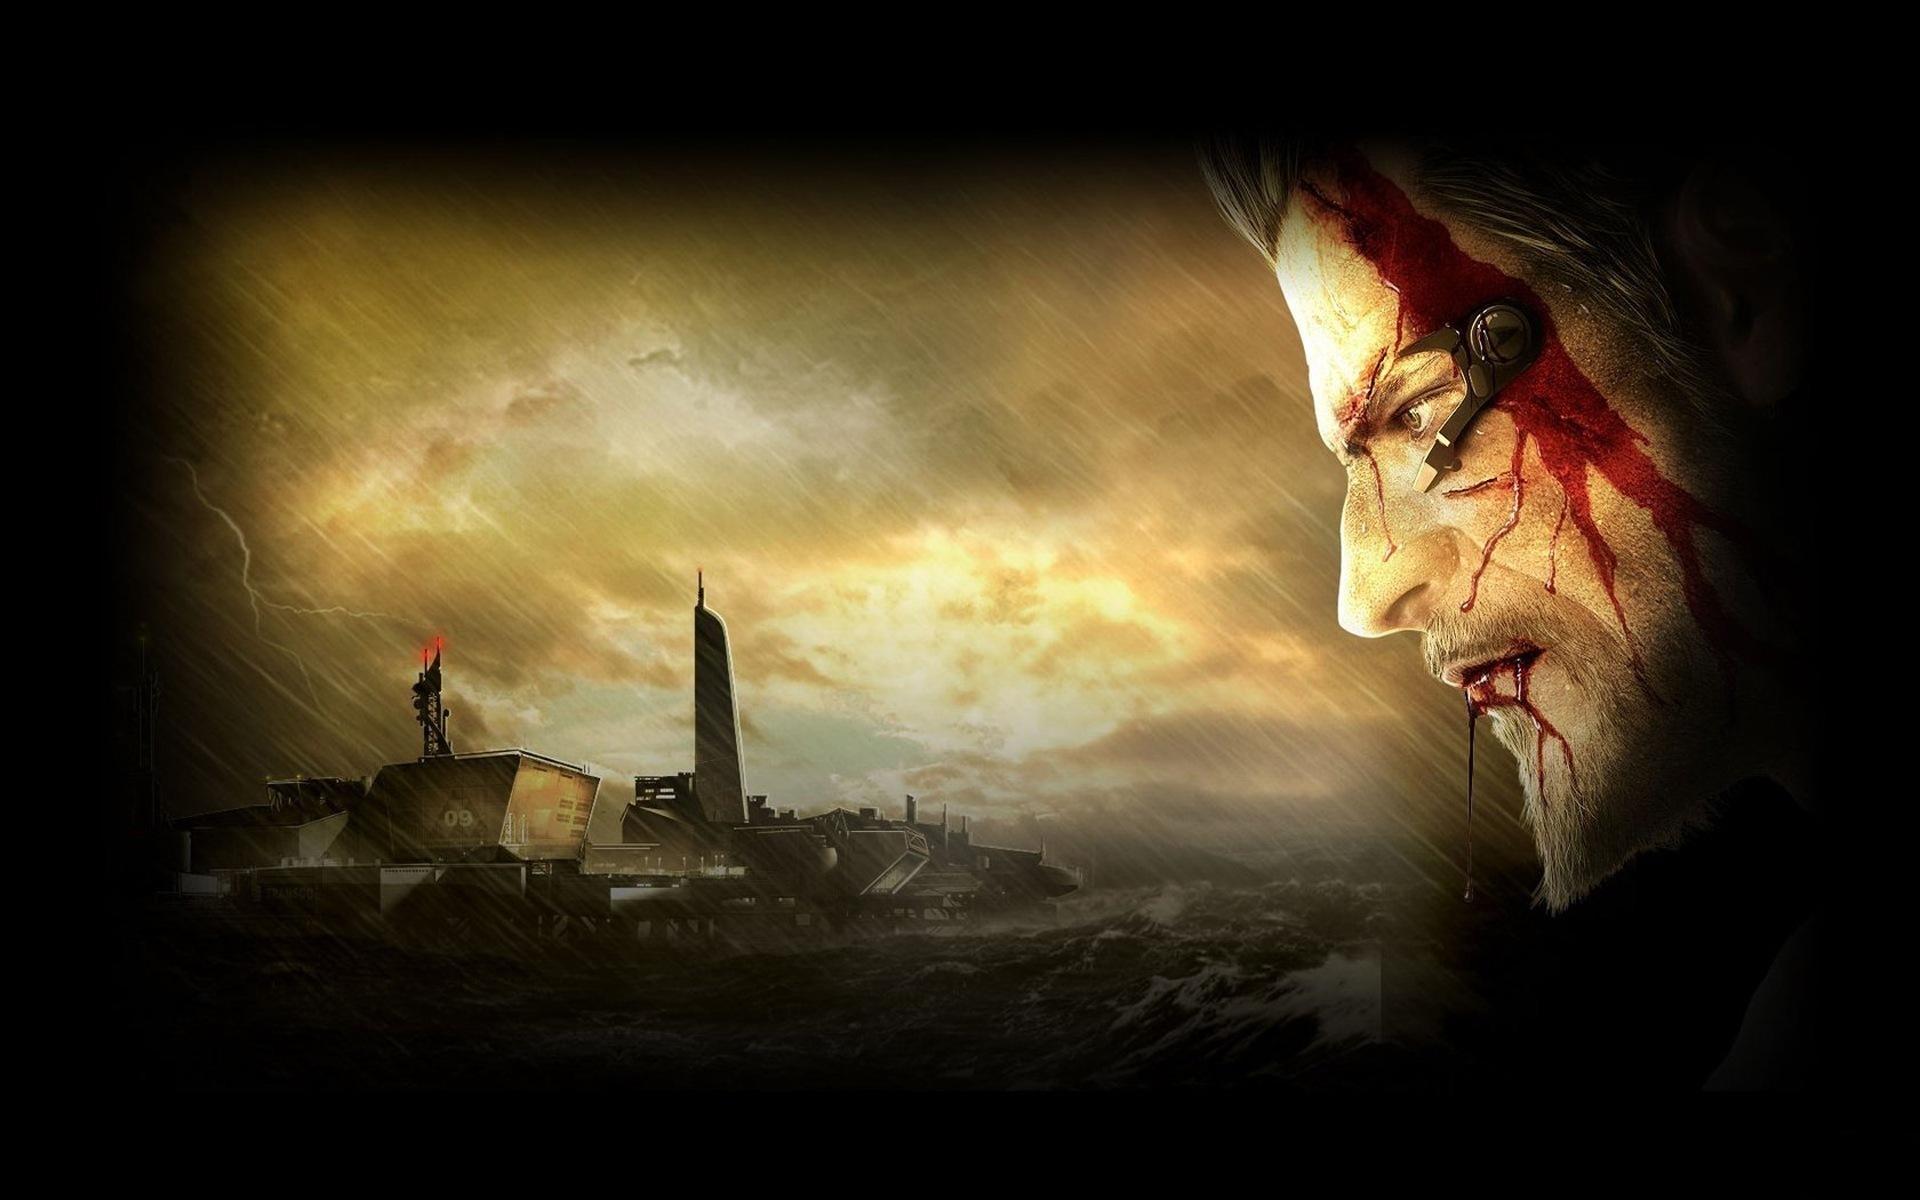 Deus Ex: Human Revolution - Недостающее звено